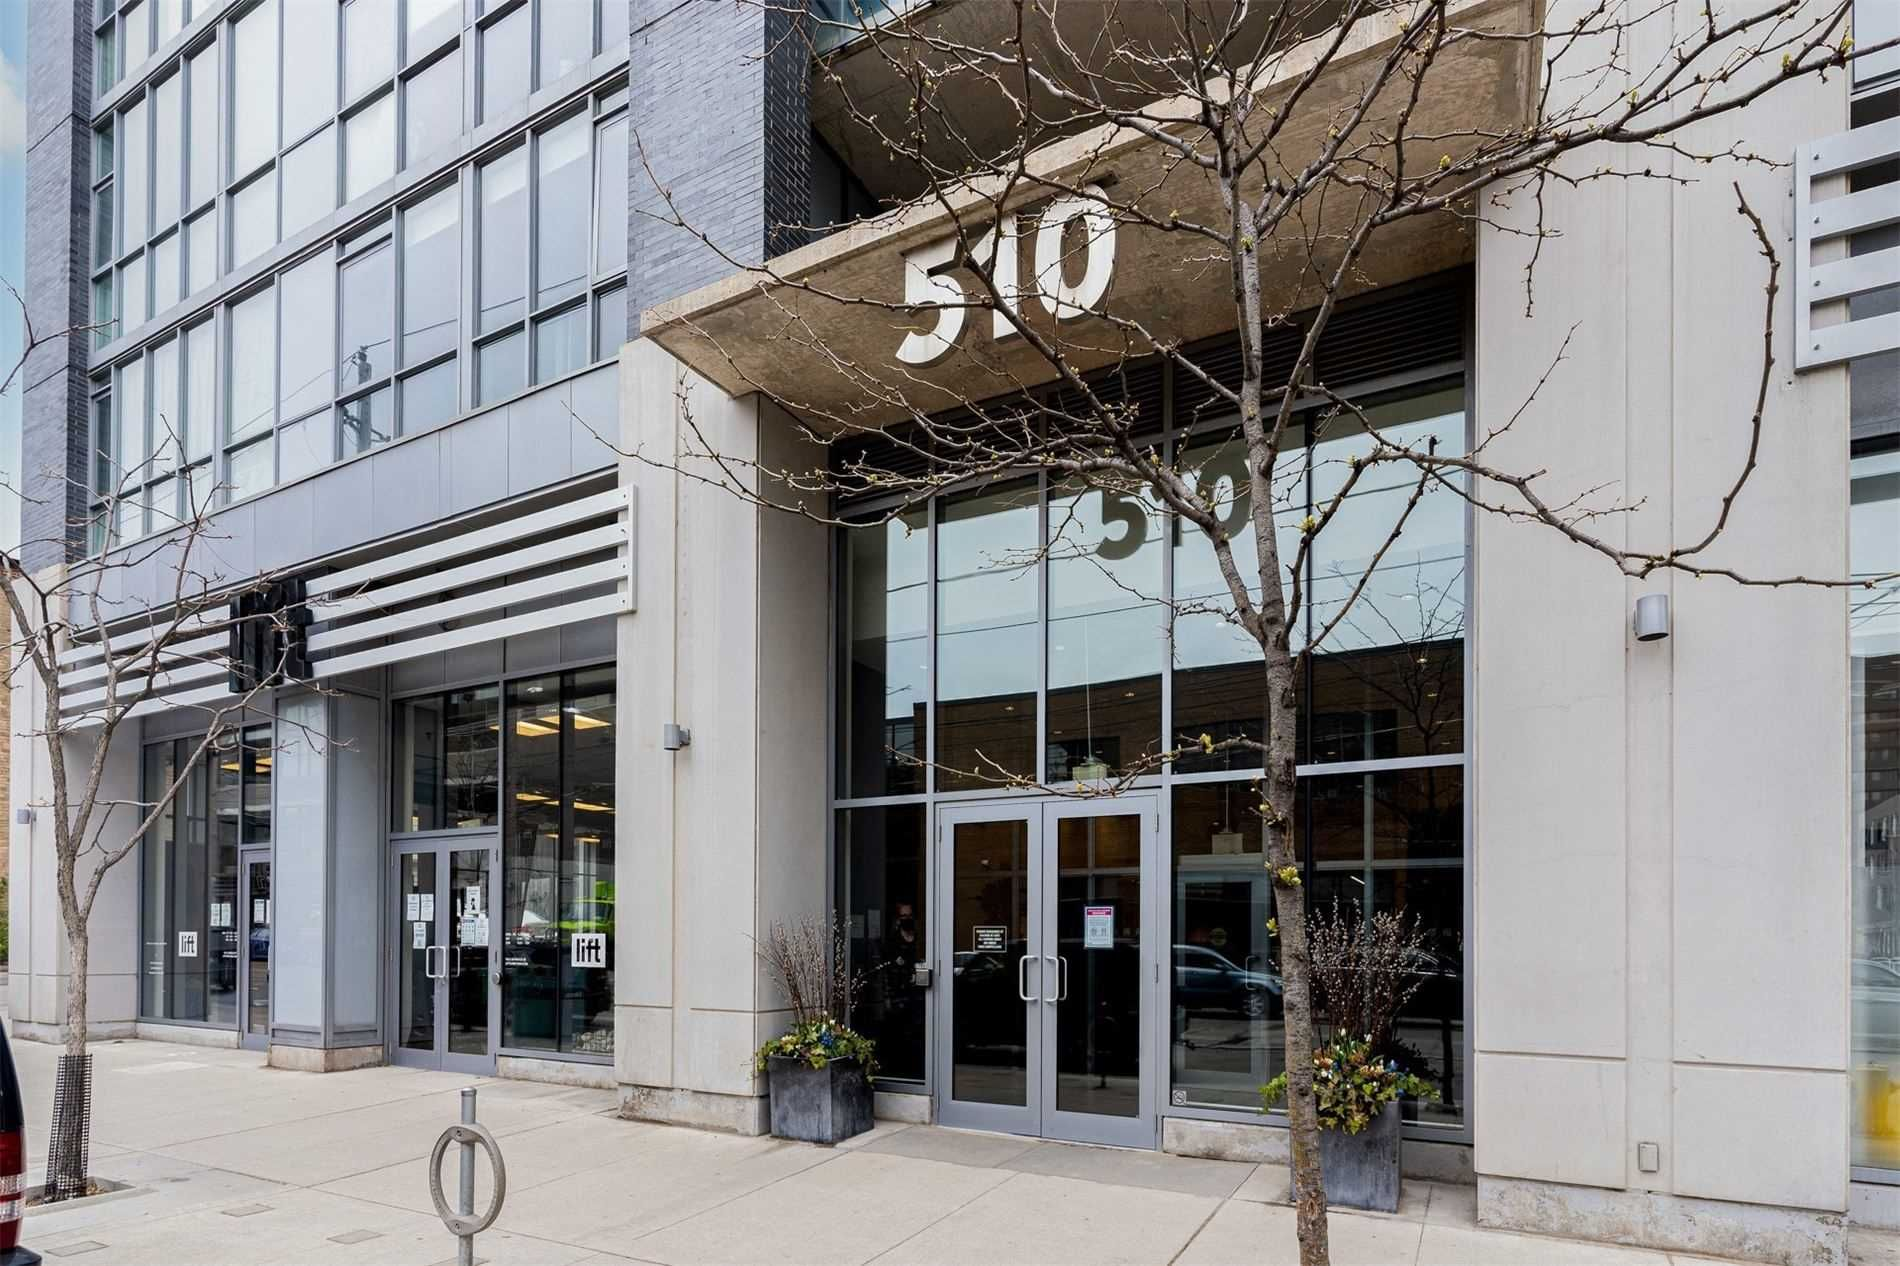 Main Photo: 425 510 E King Street in Toronto: Moss Park Condo for sale (Toronto C08)  : MLS®# C5285096